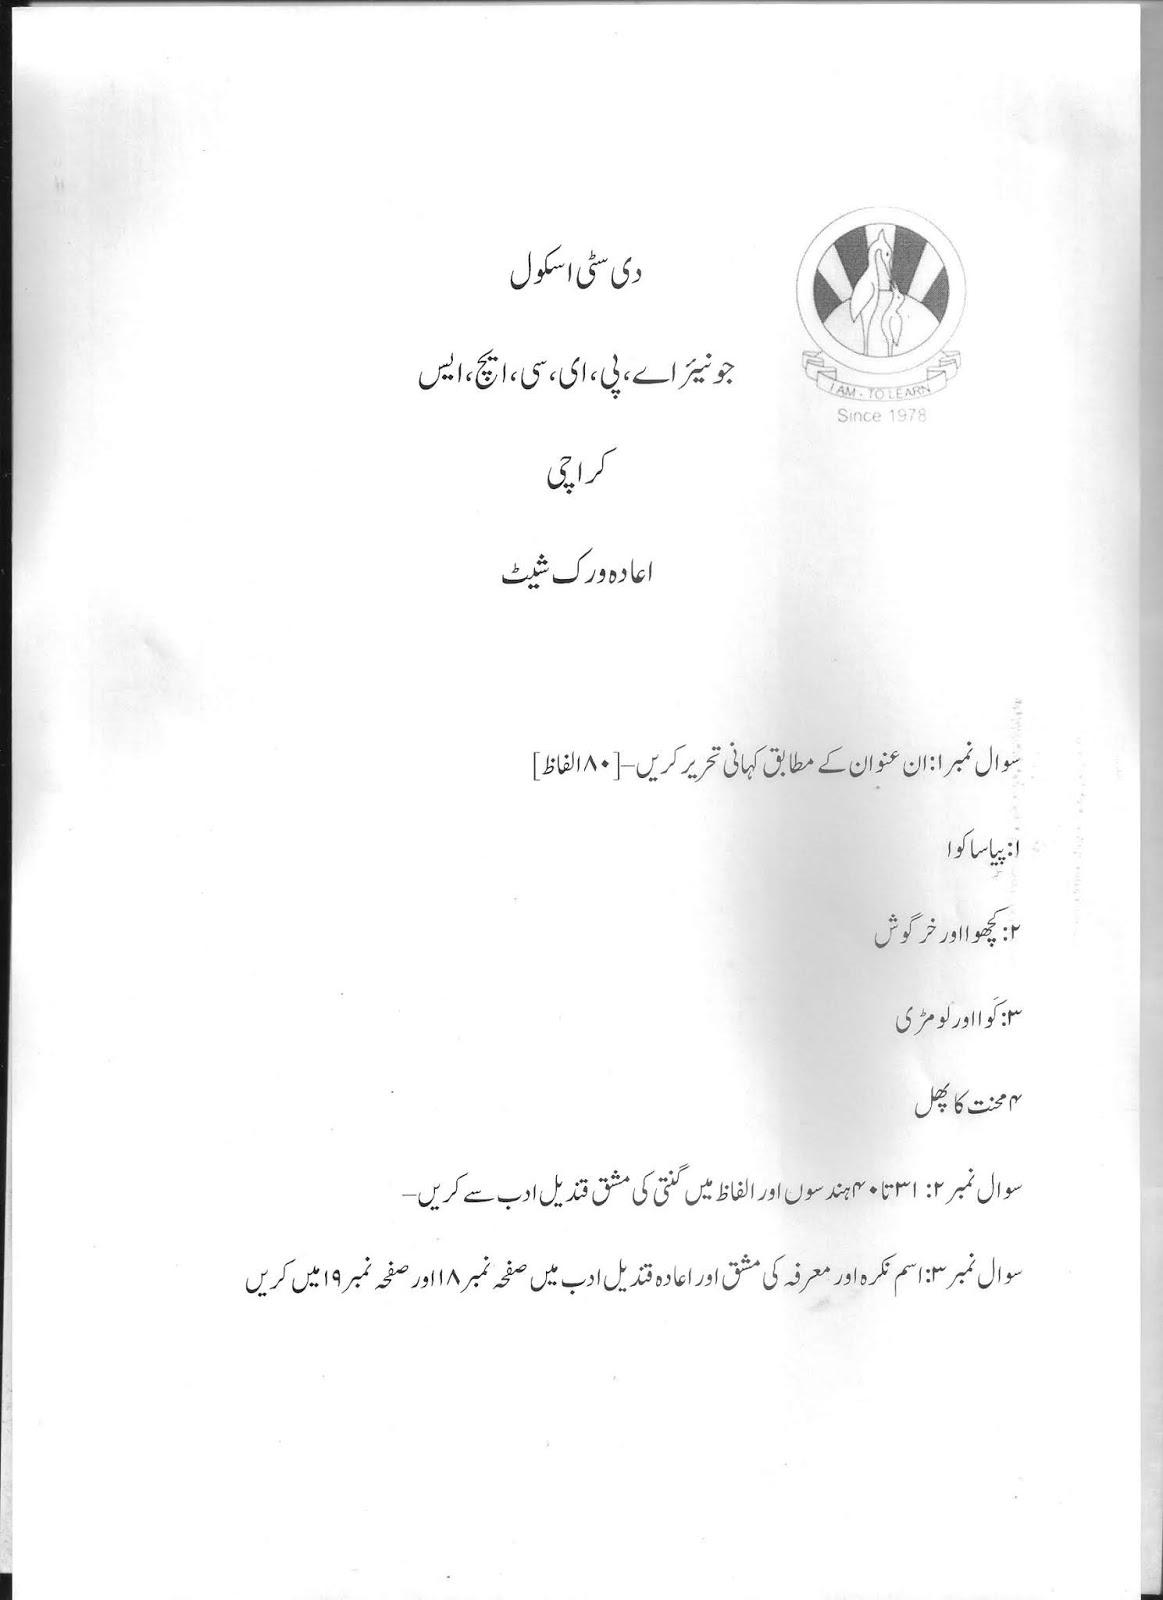 Urdu Revision Worksheet 3rd Class Test